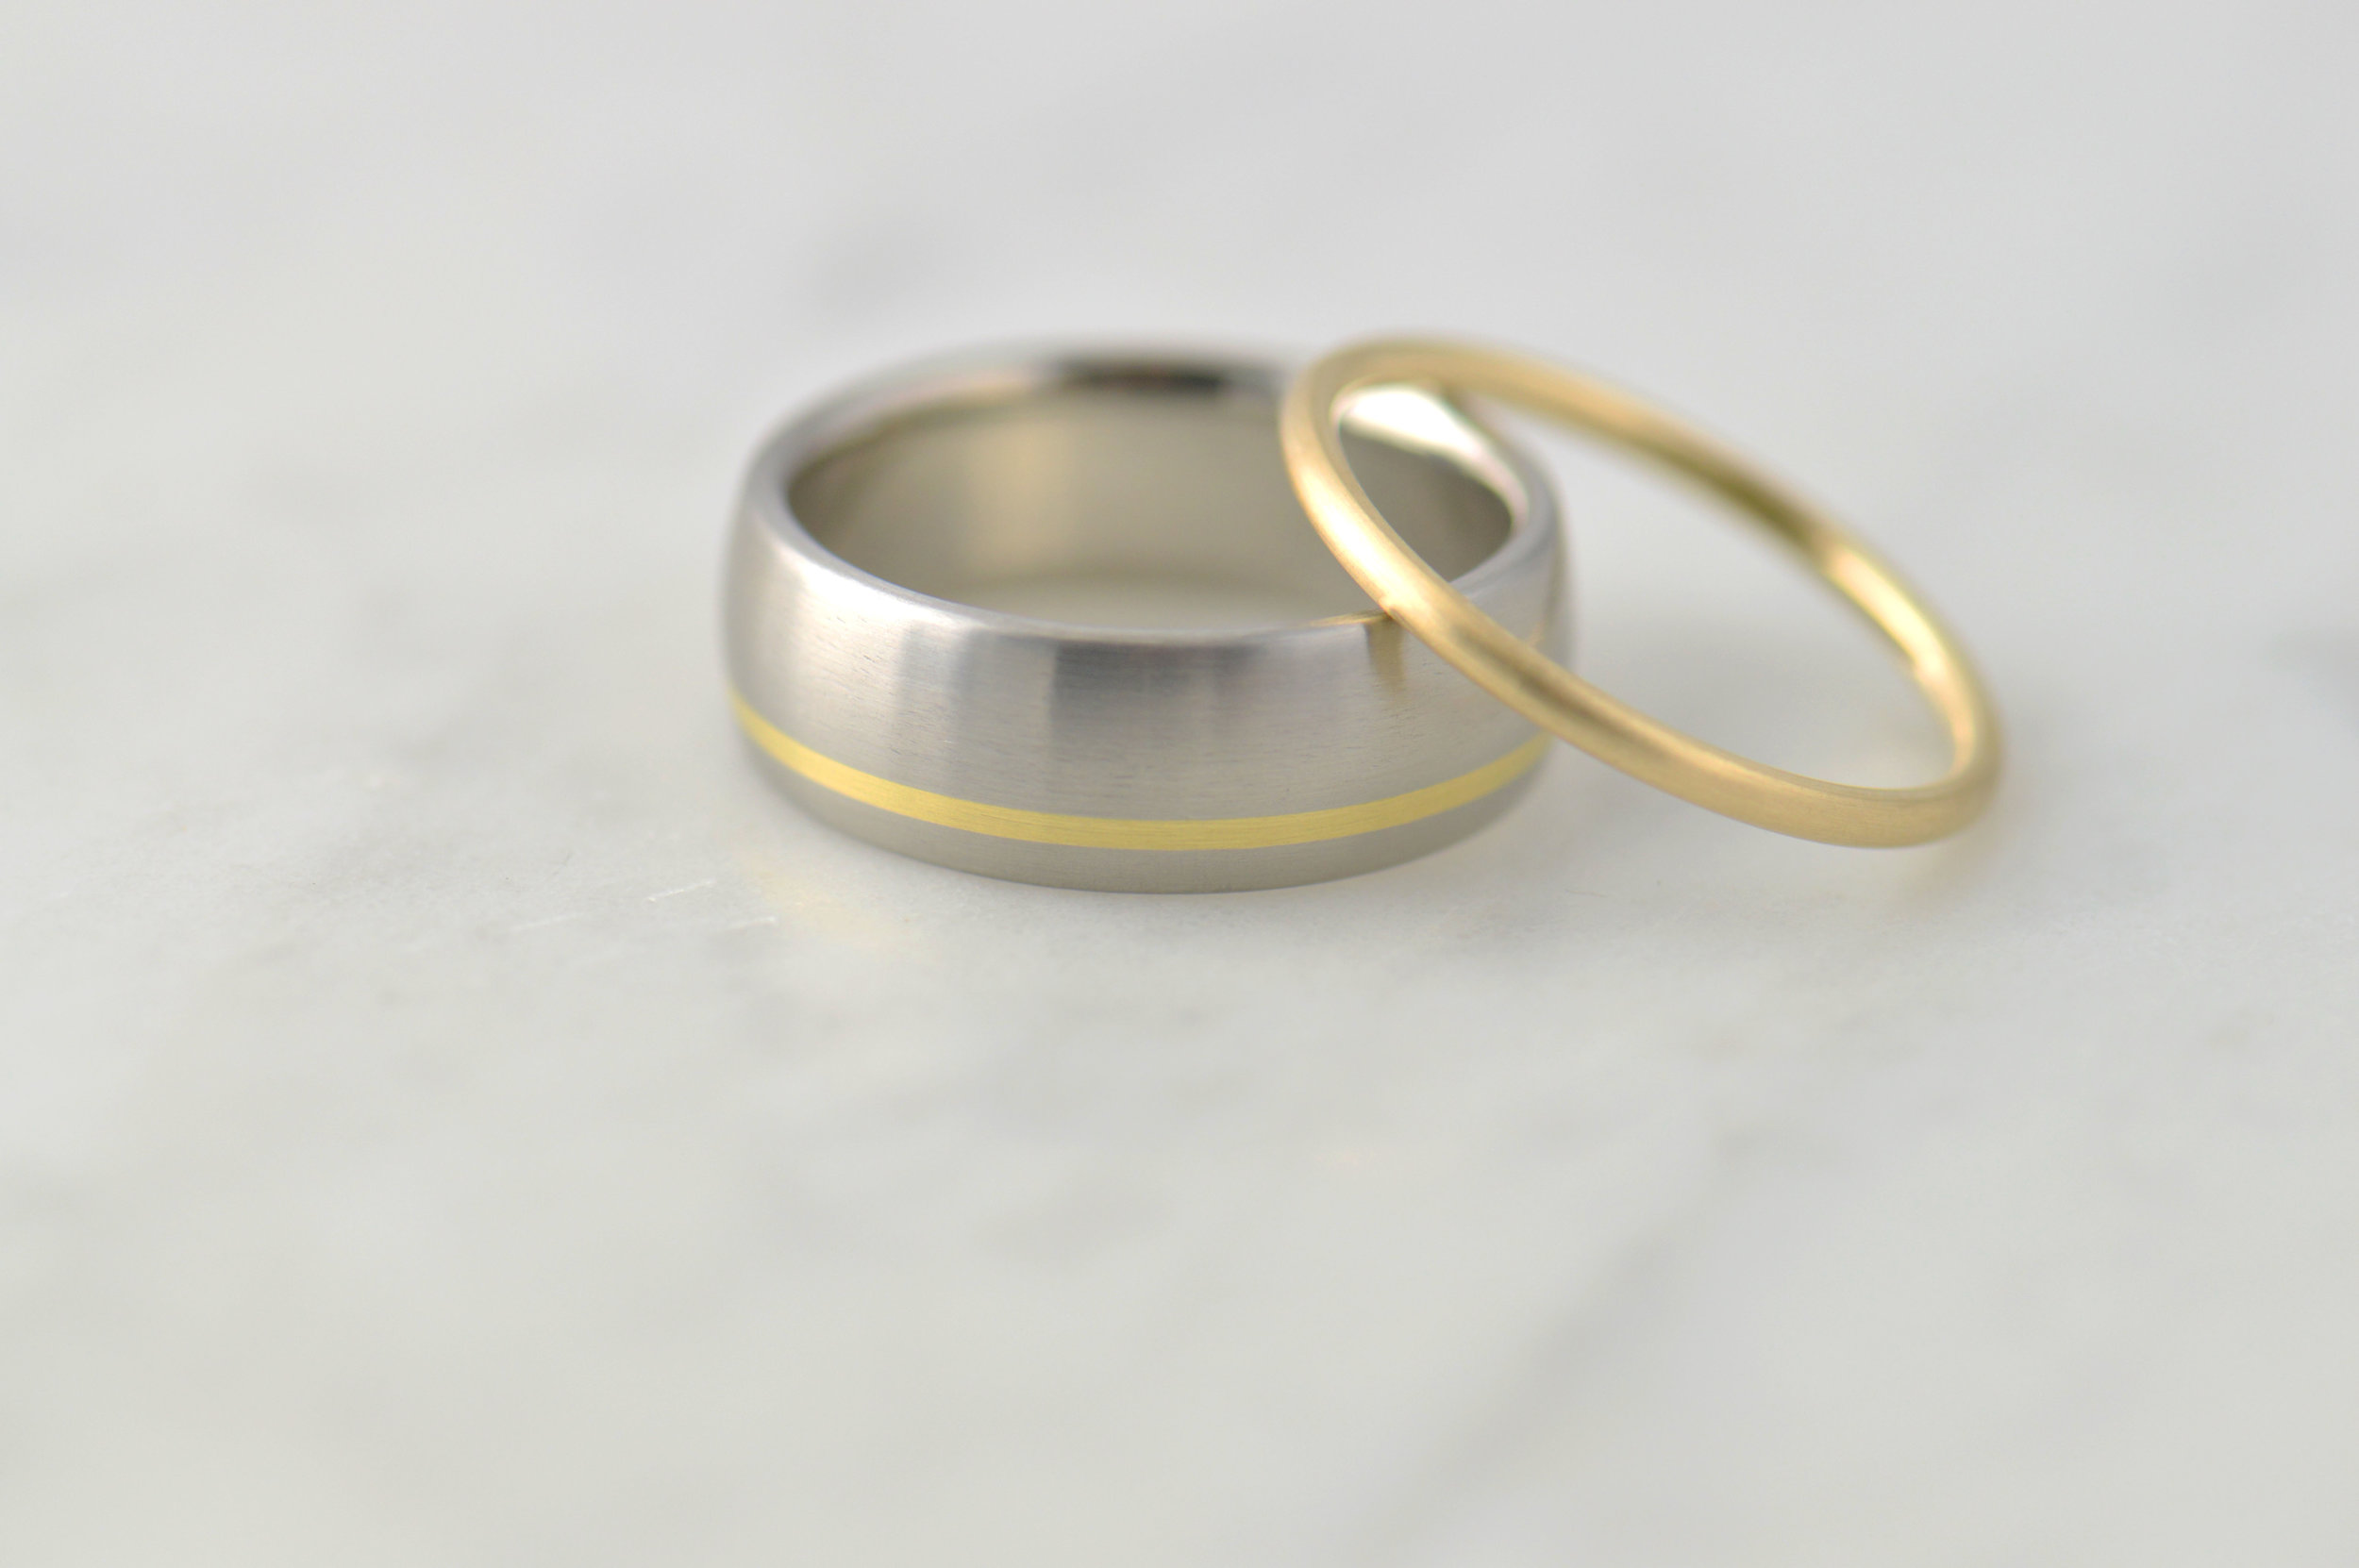 darvier-platinum-18k-minimalist-wedding-set.JPG